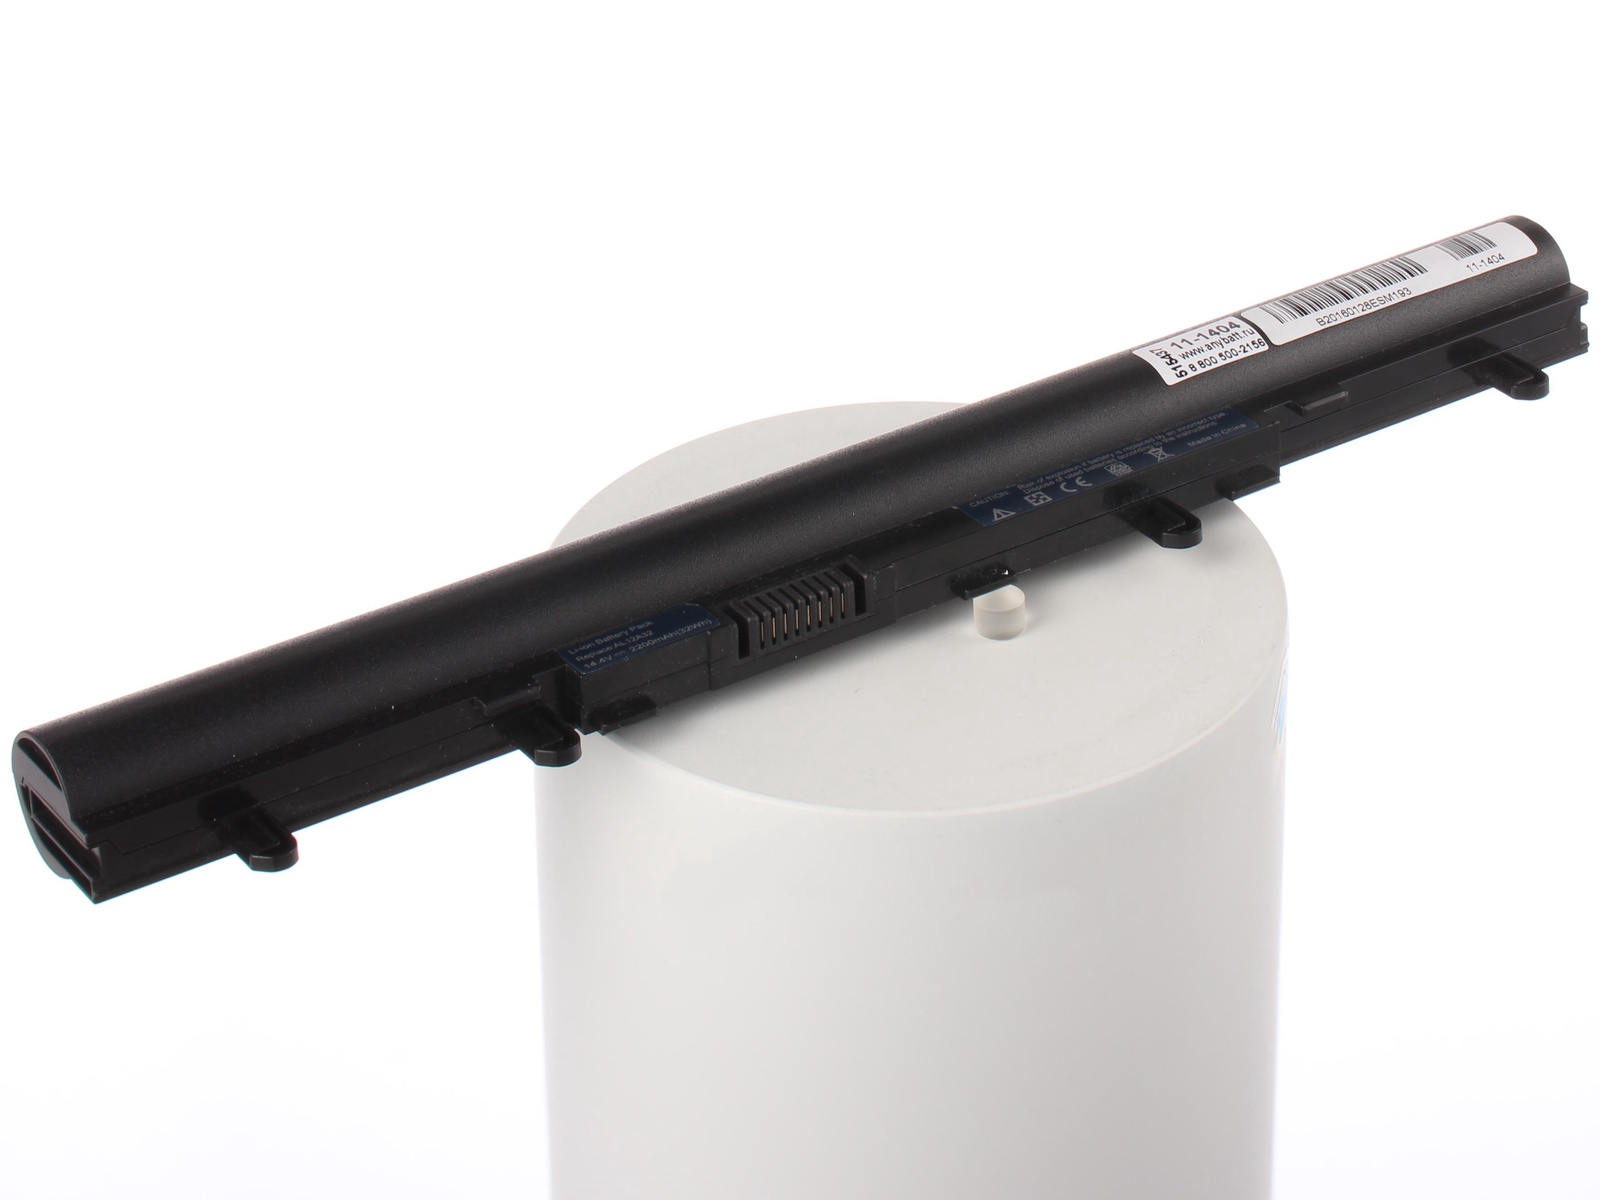 Аккумулятор для ноутбука AnyBatt для Acer Aspire V5-571G-53316G50Ma, Aspire V5-571G-53336G75Ma, Aspire V5-571PG-53336G50Ma, Aspire E1-532G-35568G75Mnkk, Aspire E1-570G-53334G50Mnii, Aspire E1-572G-34014G50Mnii аккумулятор для ноутбука anybatt для acer aspire e1 532g 35584g50mnkk aspire e1 570g 33214g32mnkk aspire v5 571pg 73536g75ma aspire e1 470p 6659 aspire e1 522 12504g50mn aspire e1 522 45004g1tmn aspire e1 570g 33214g50mnii